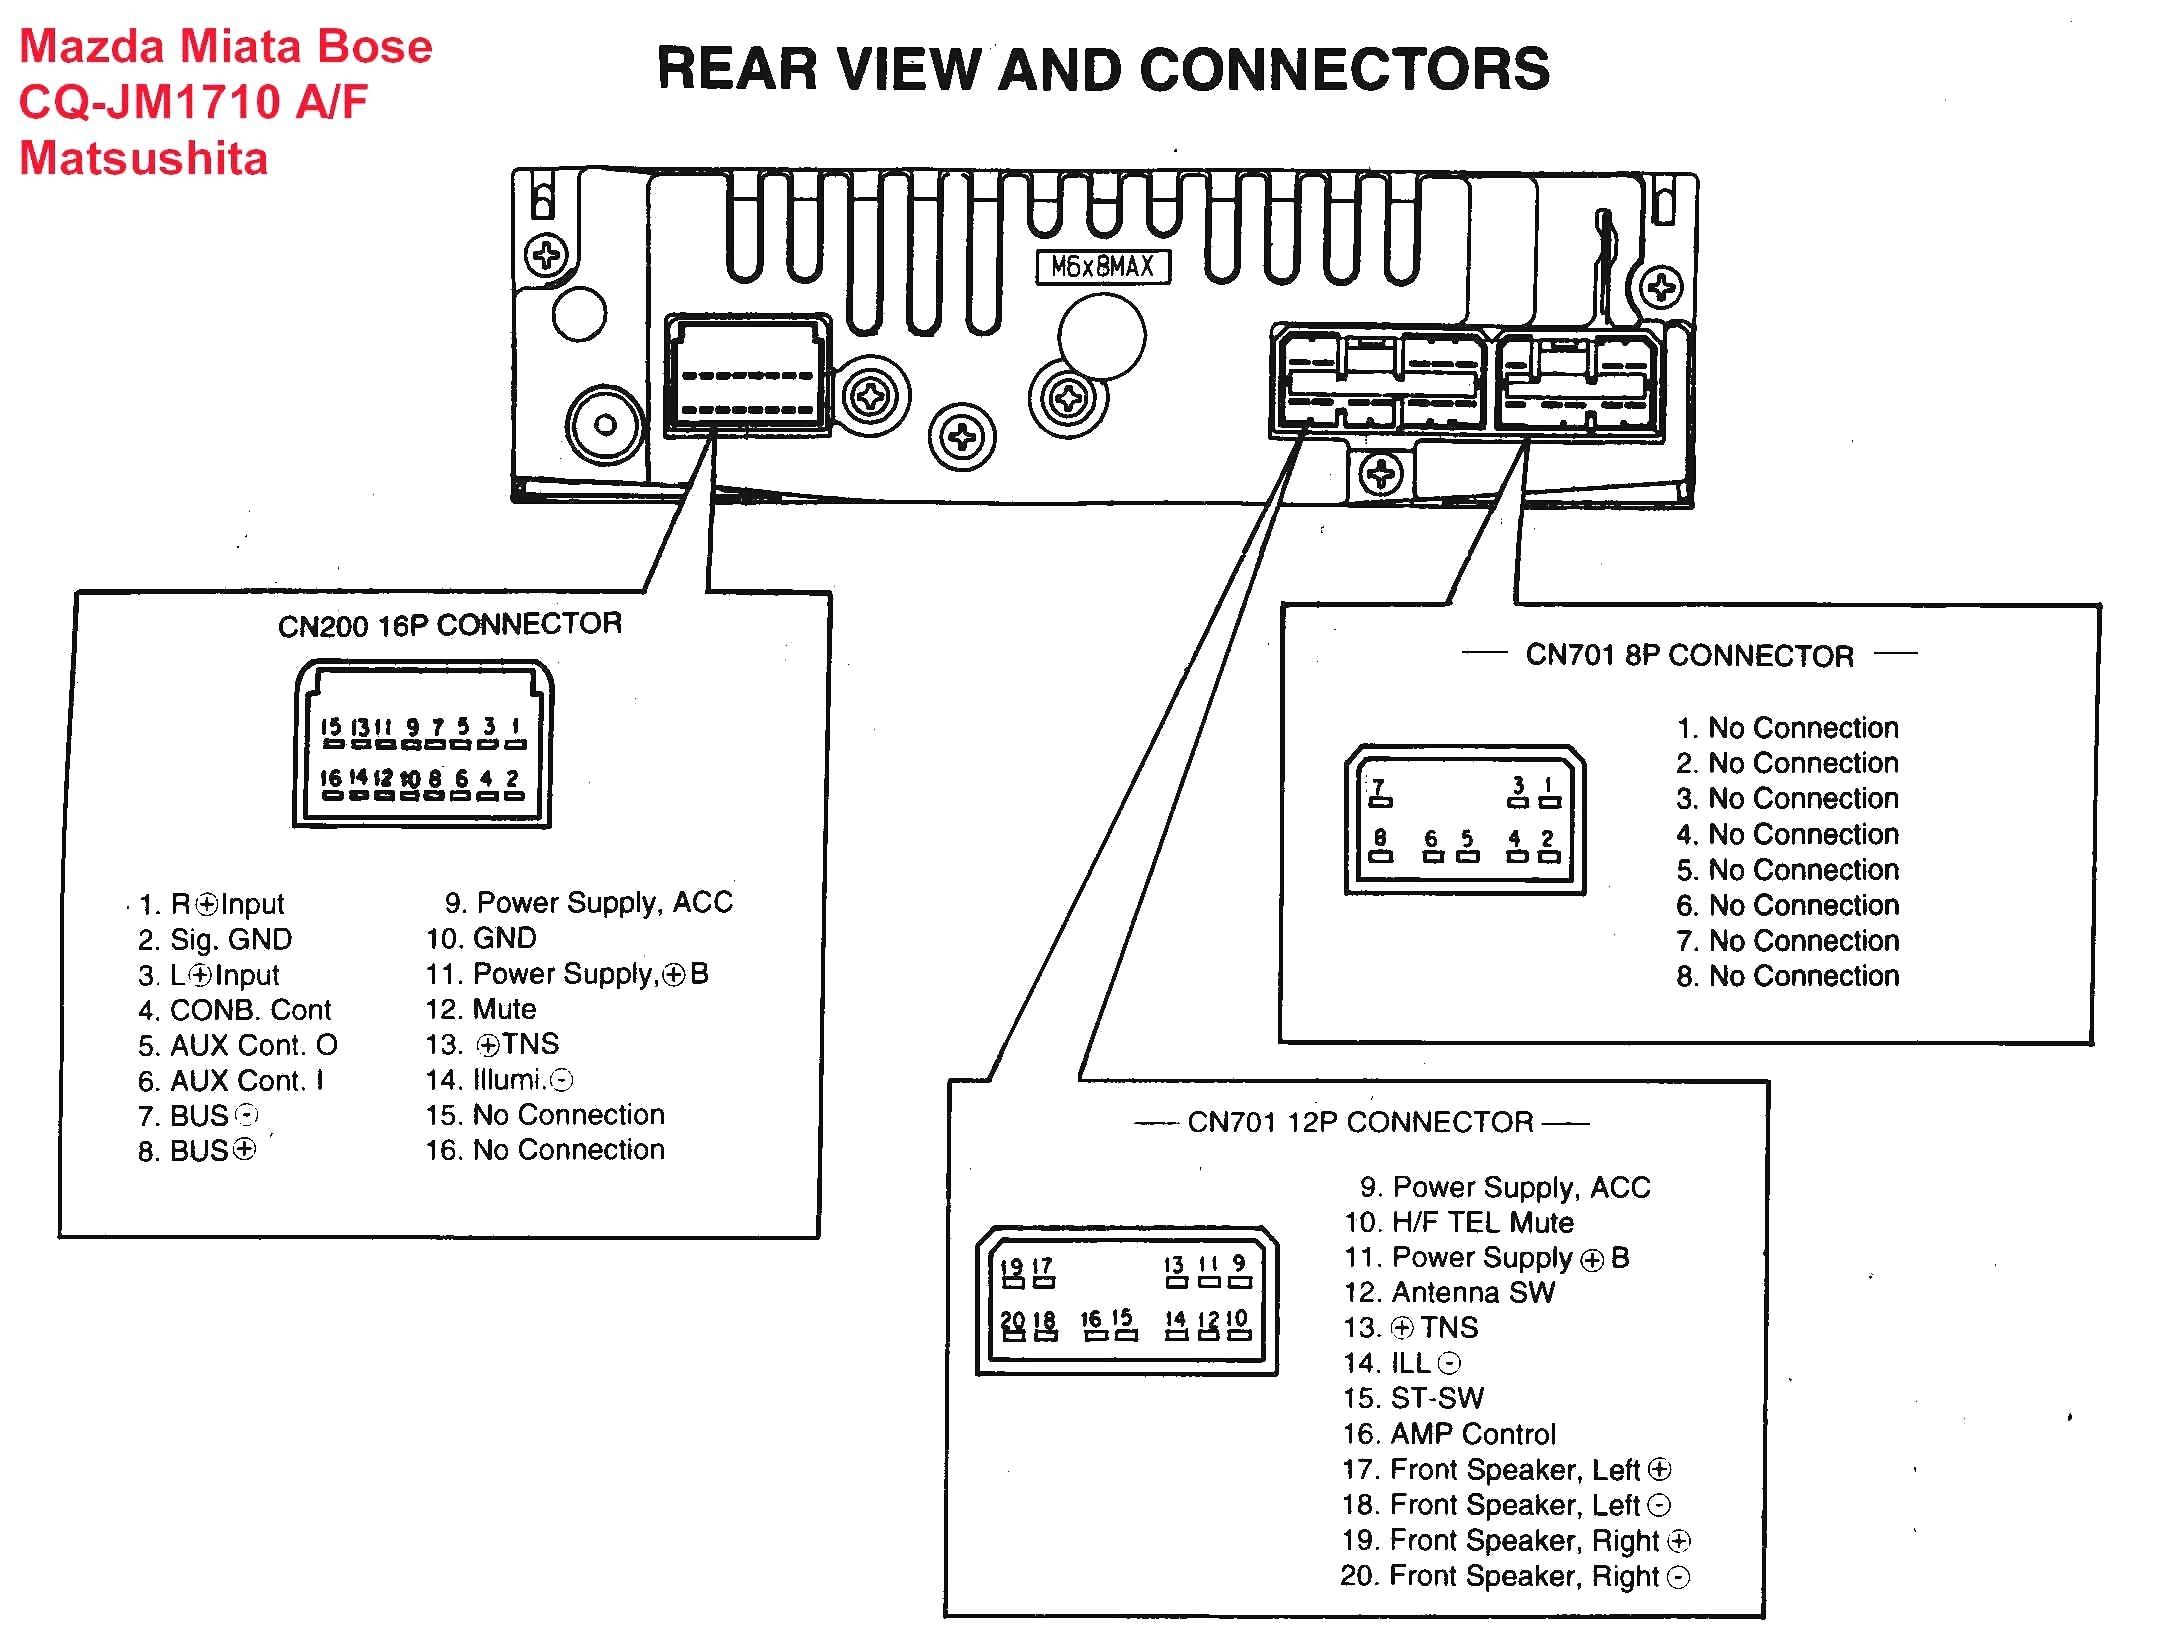 deh 1600 wiring diagram wiring diagram toolboxpioneer deh 16 wiring harness diagram wiring diagram datasource deh